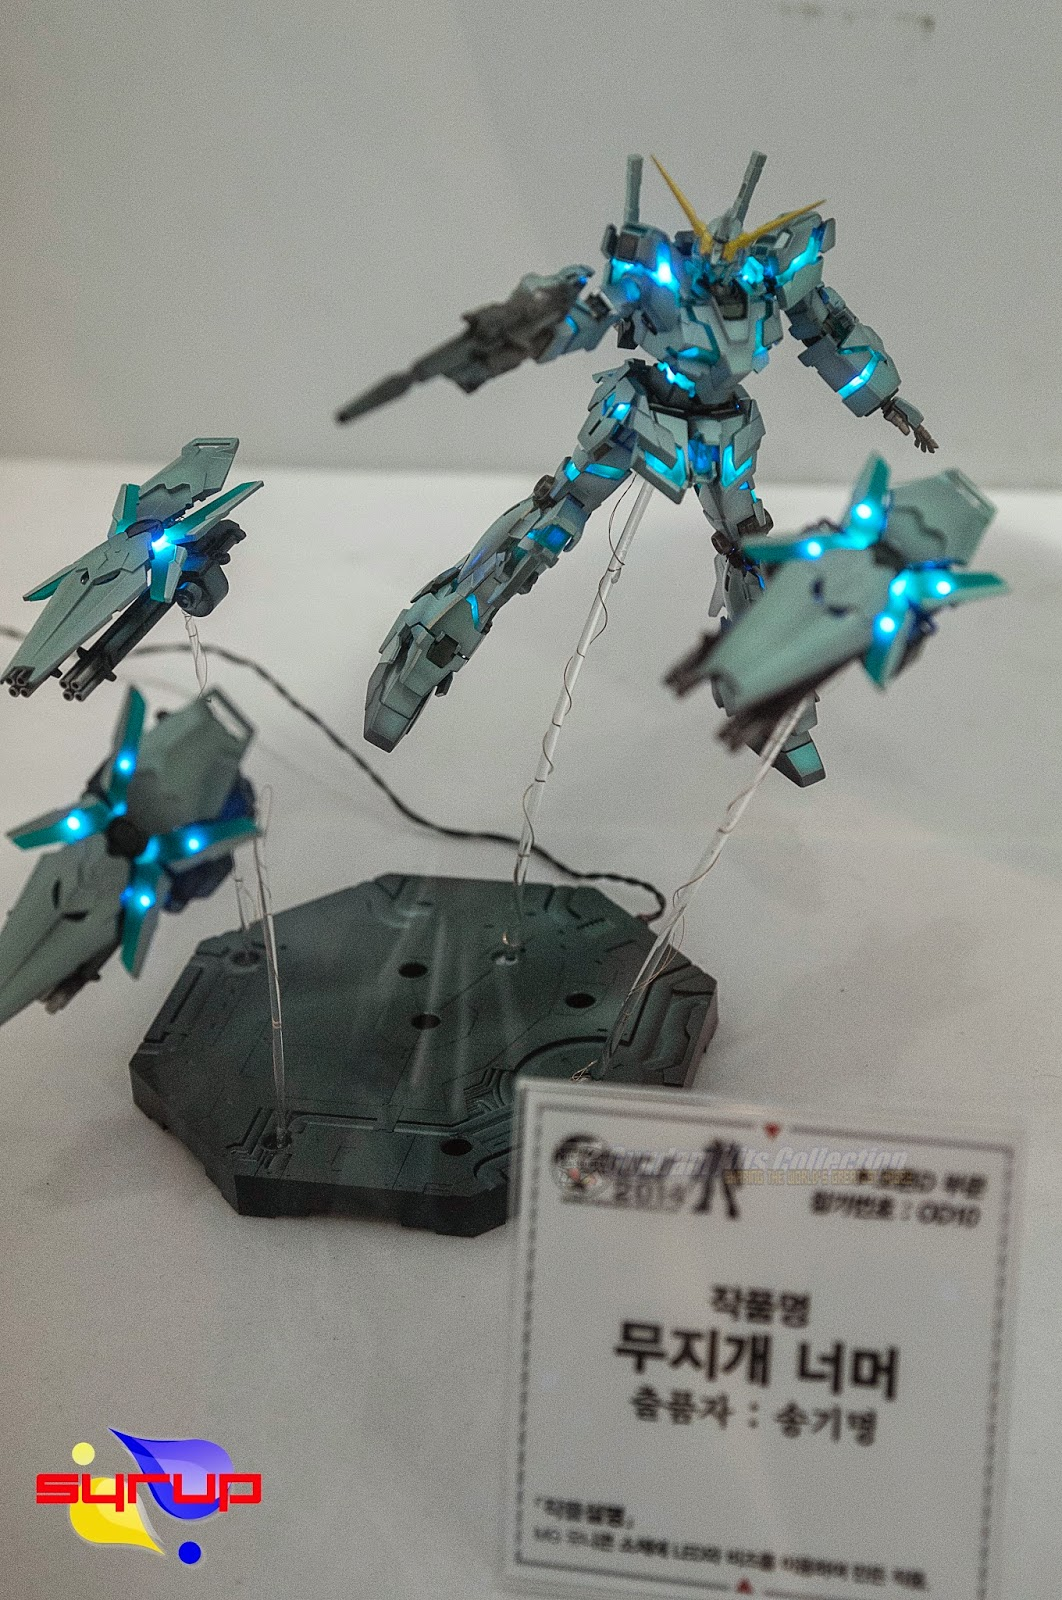 GBWC 2014 Korea Entries Gallery